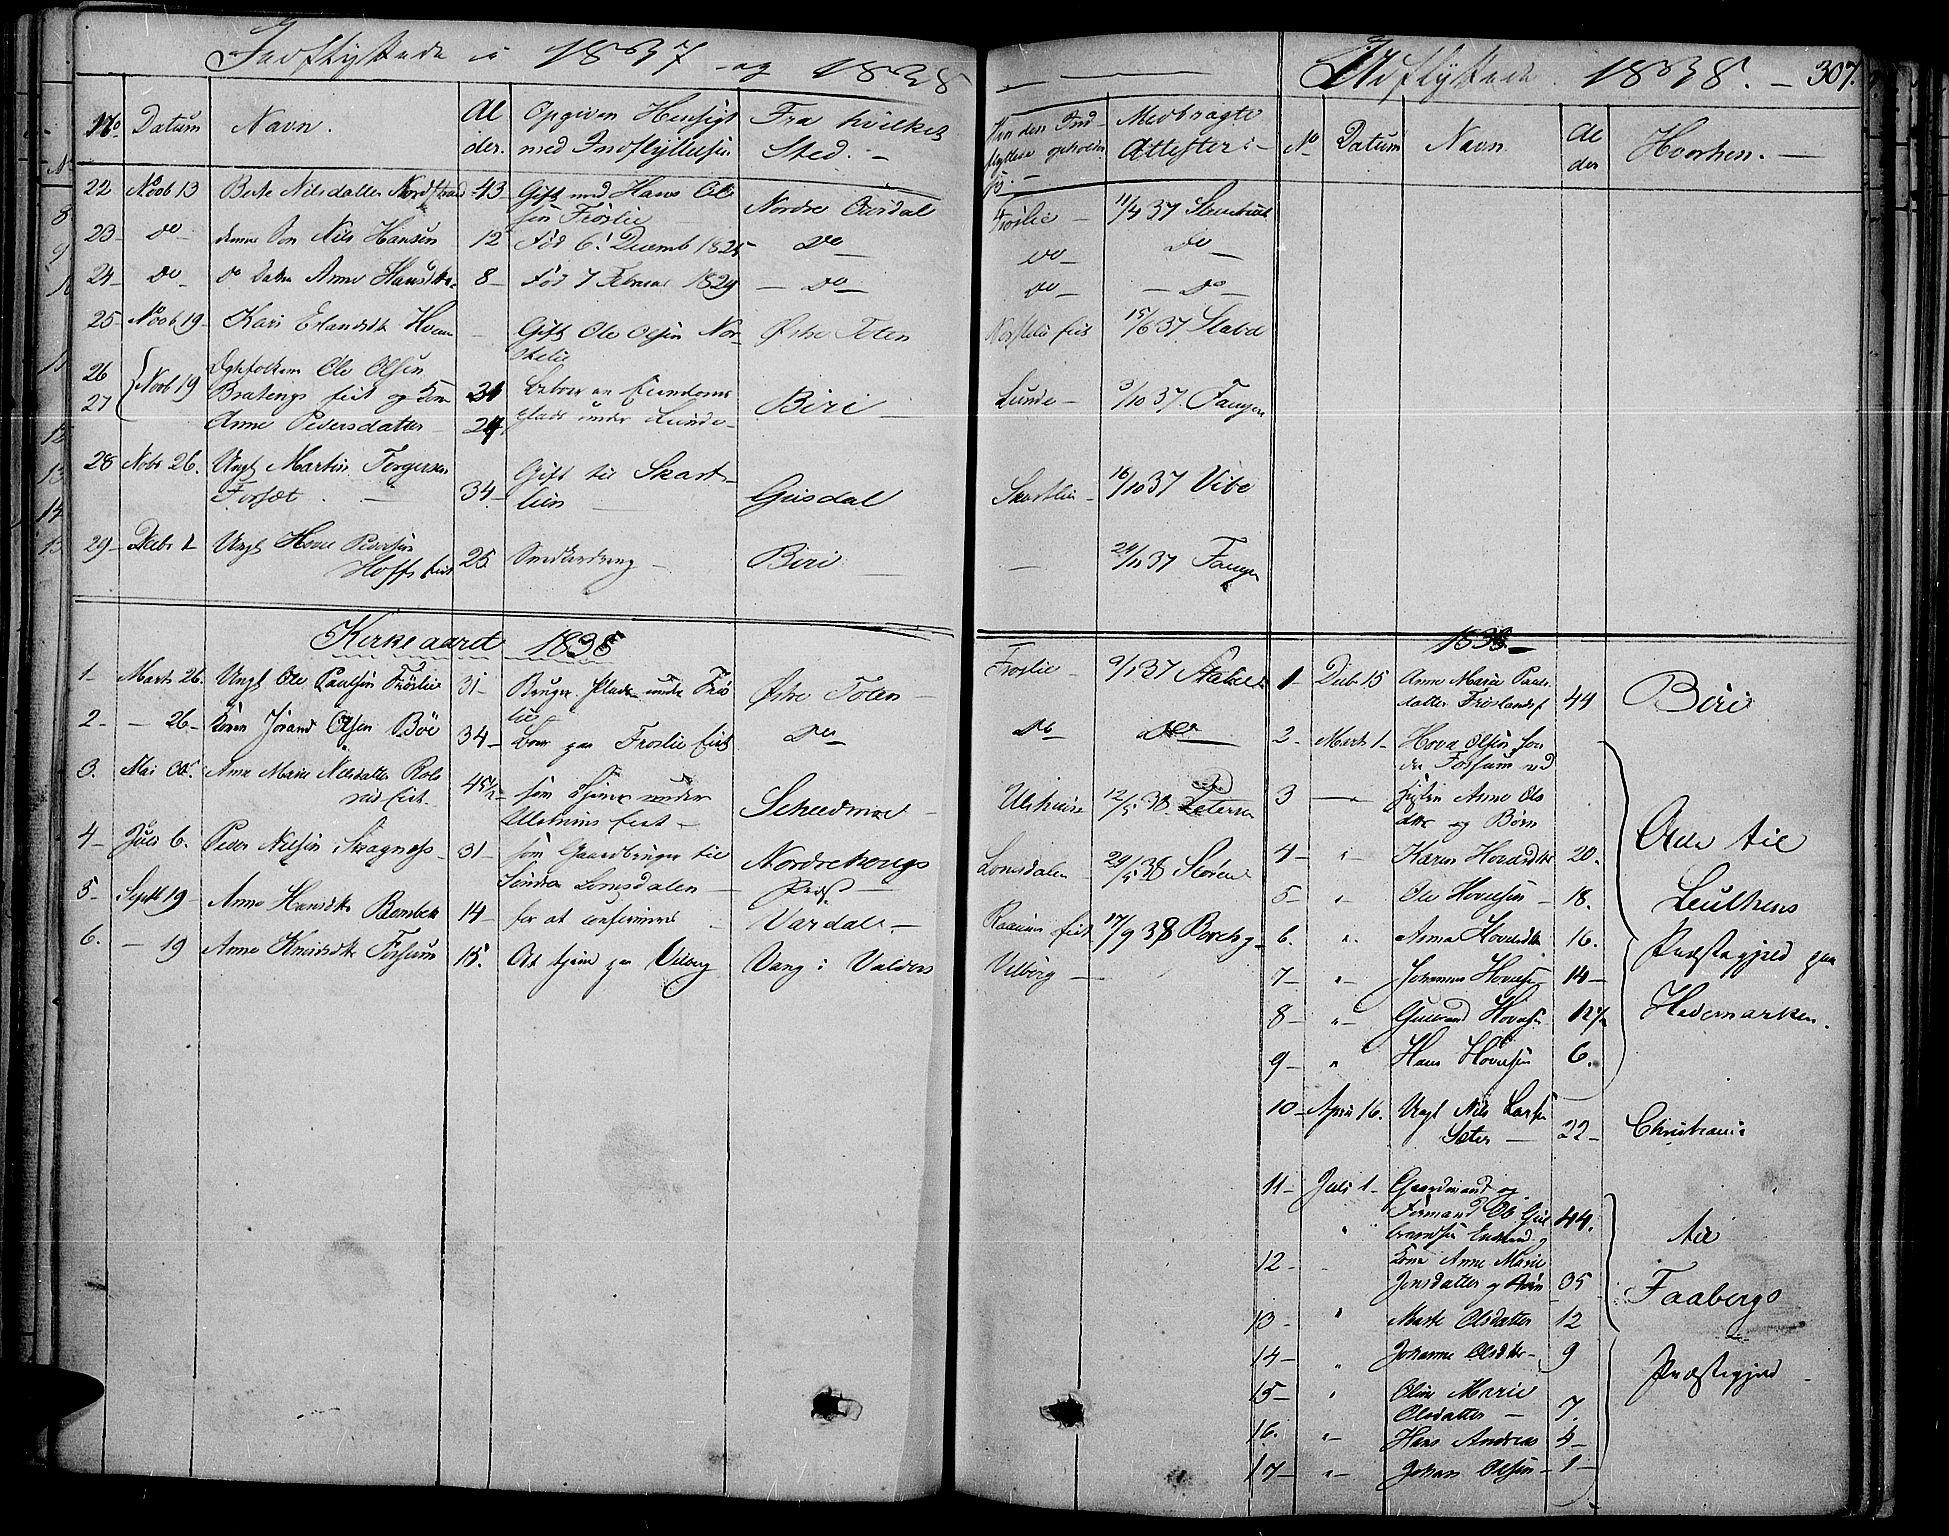 SAH, Land prestekontor, Ministerialbok nr. 8, 1830-1846, s. 307